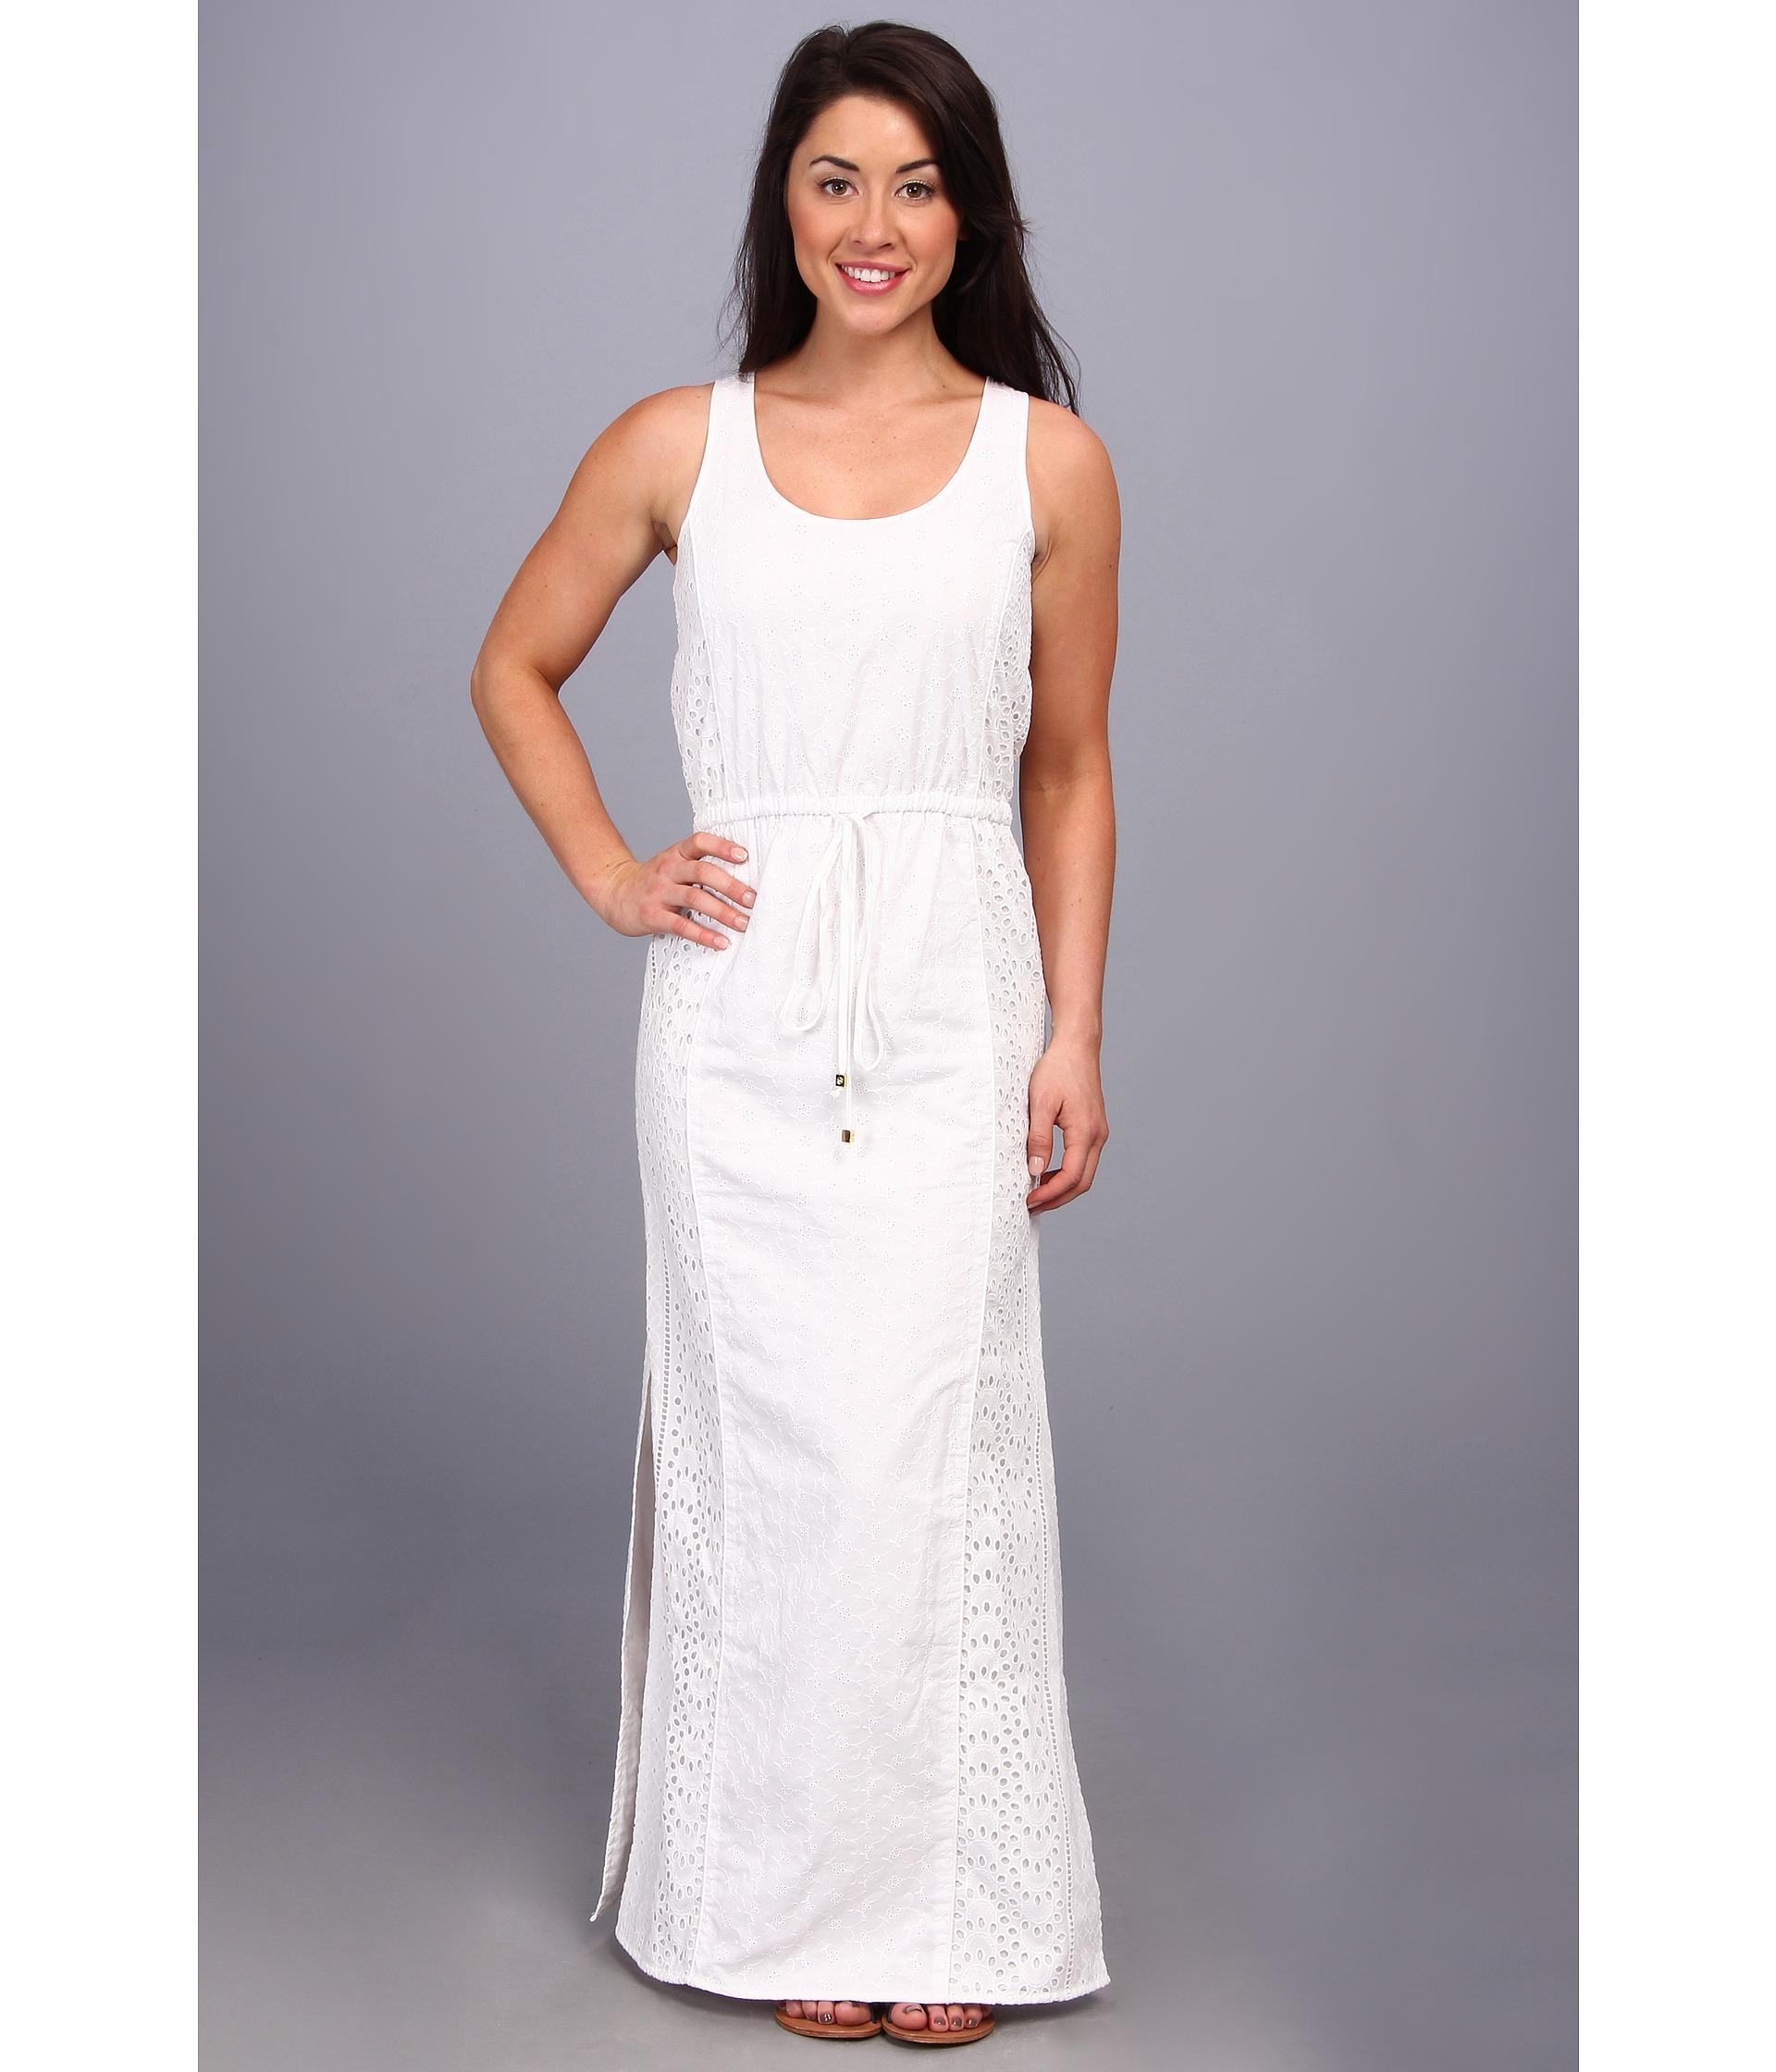 Lyst - Michael Michael Kors Petite Eyelet Sl Maxi Dress in White